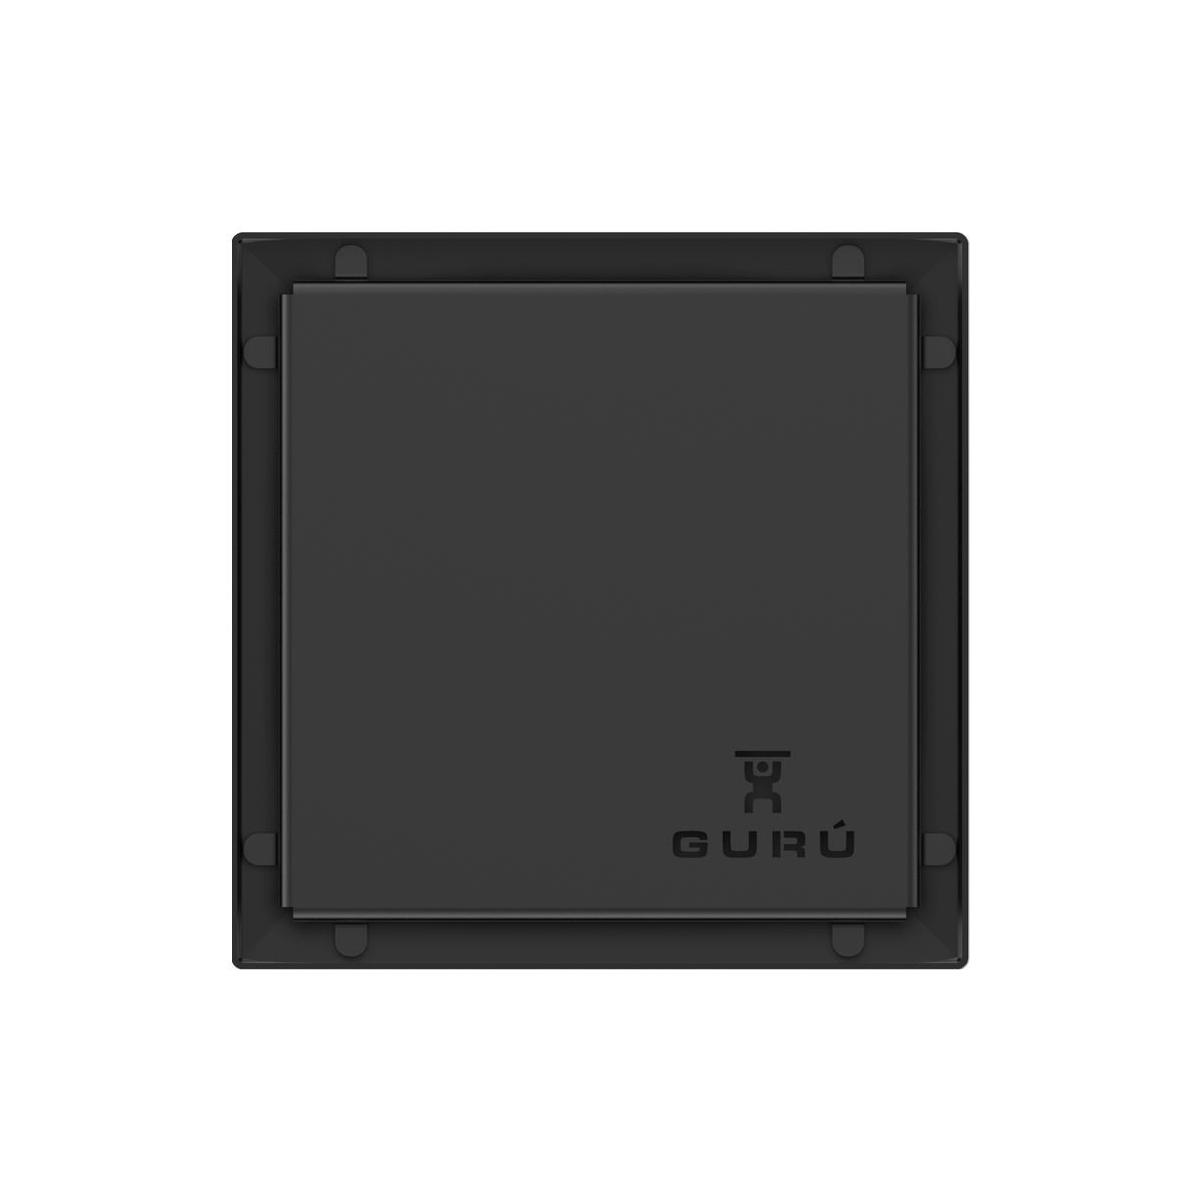 Sumidero negro para ducha Evolux Dark Liso